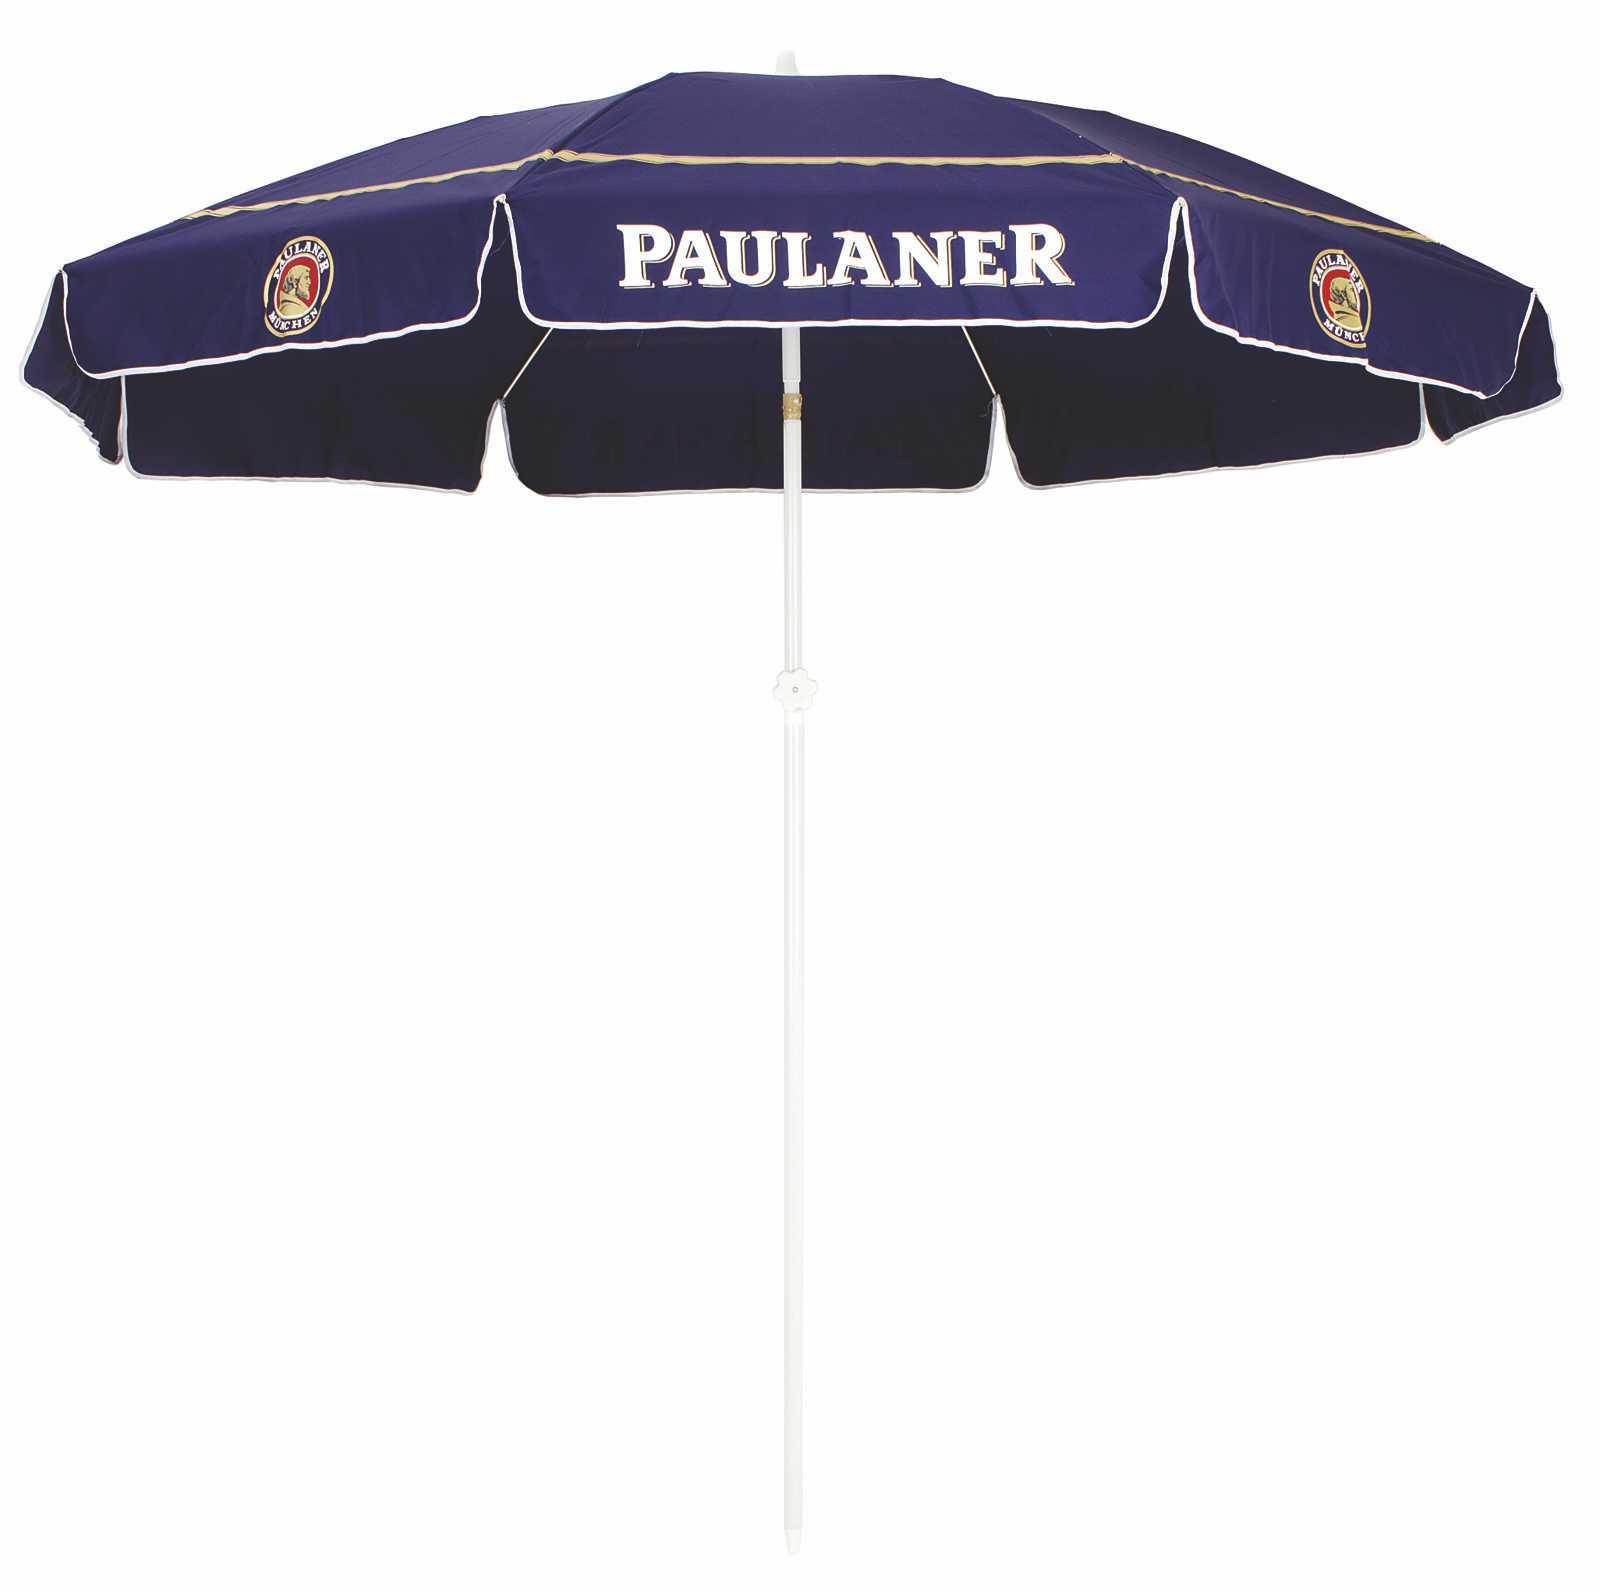 paulaner sonnenschirm biergarten paulaner fan shop. Black Bedroom Furniture Sets. Home Design Ideas